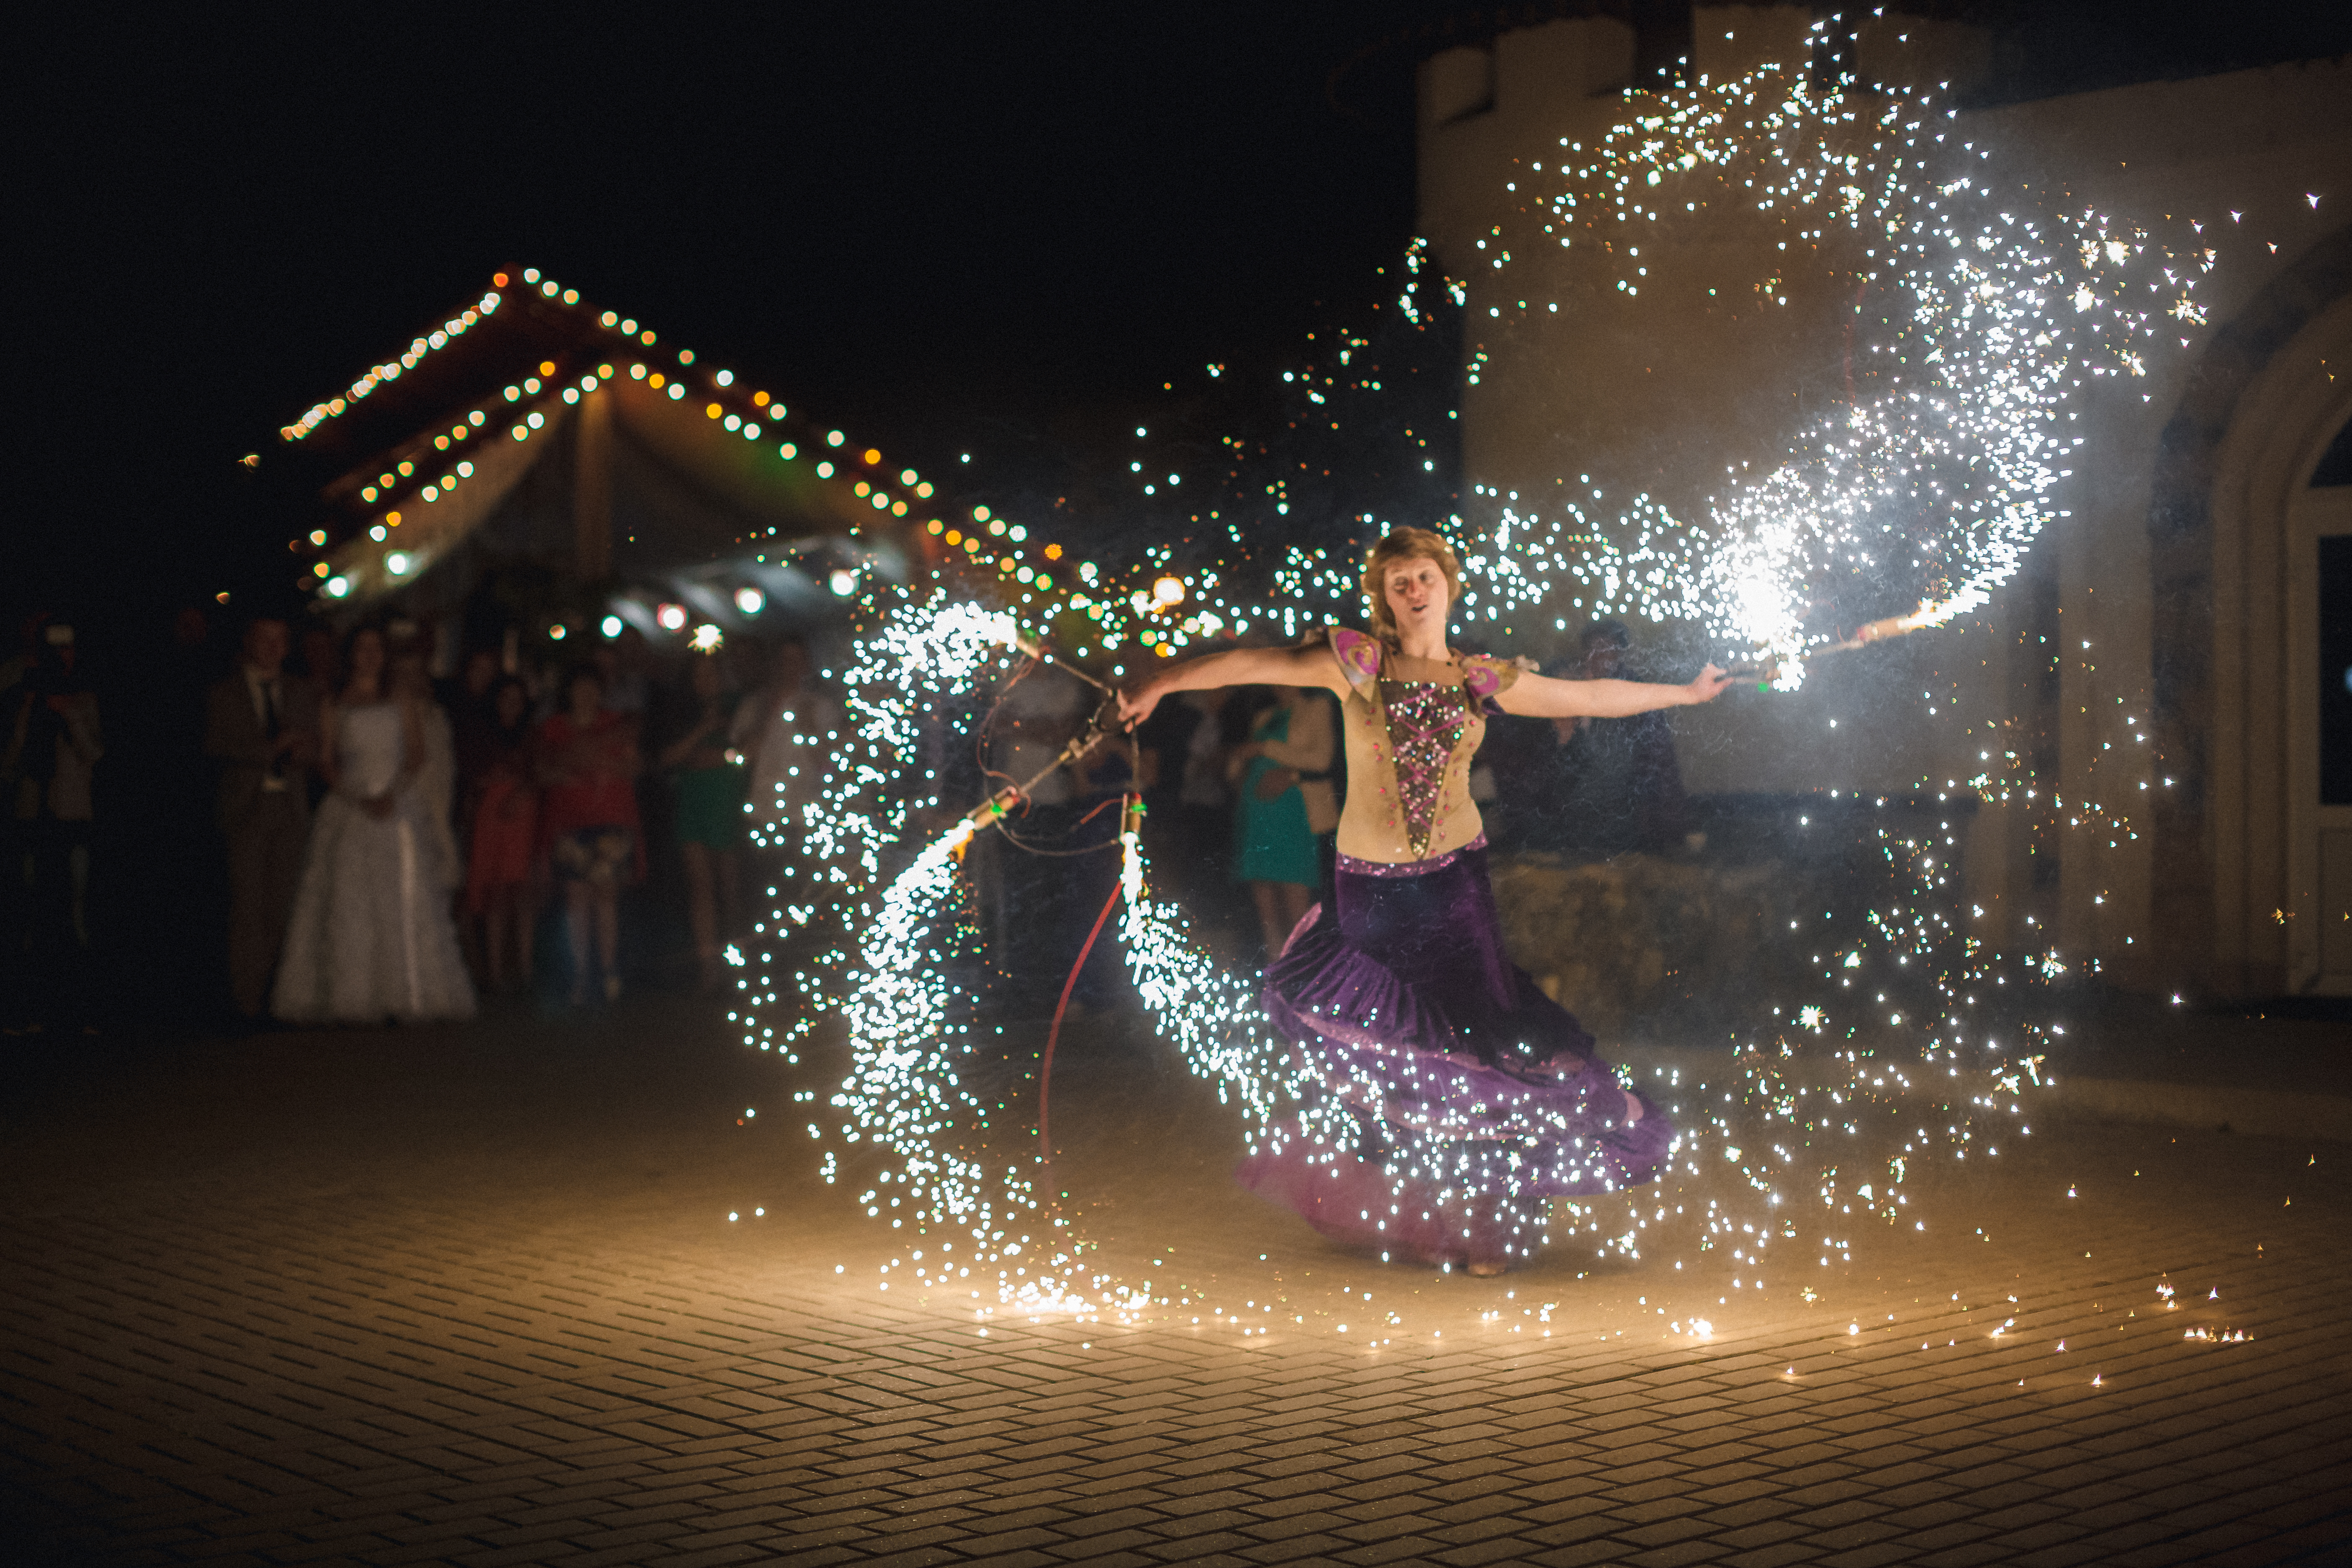 фаер шоу на свадьбу в саранске